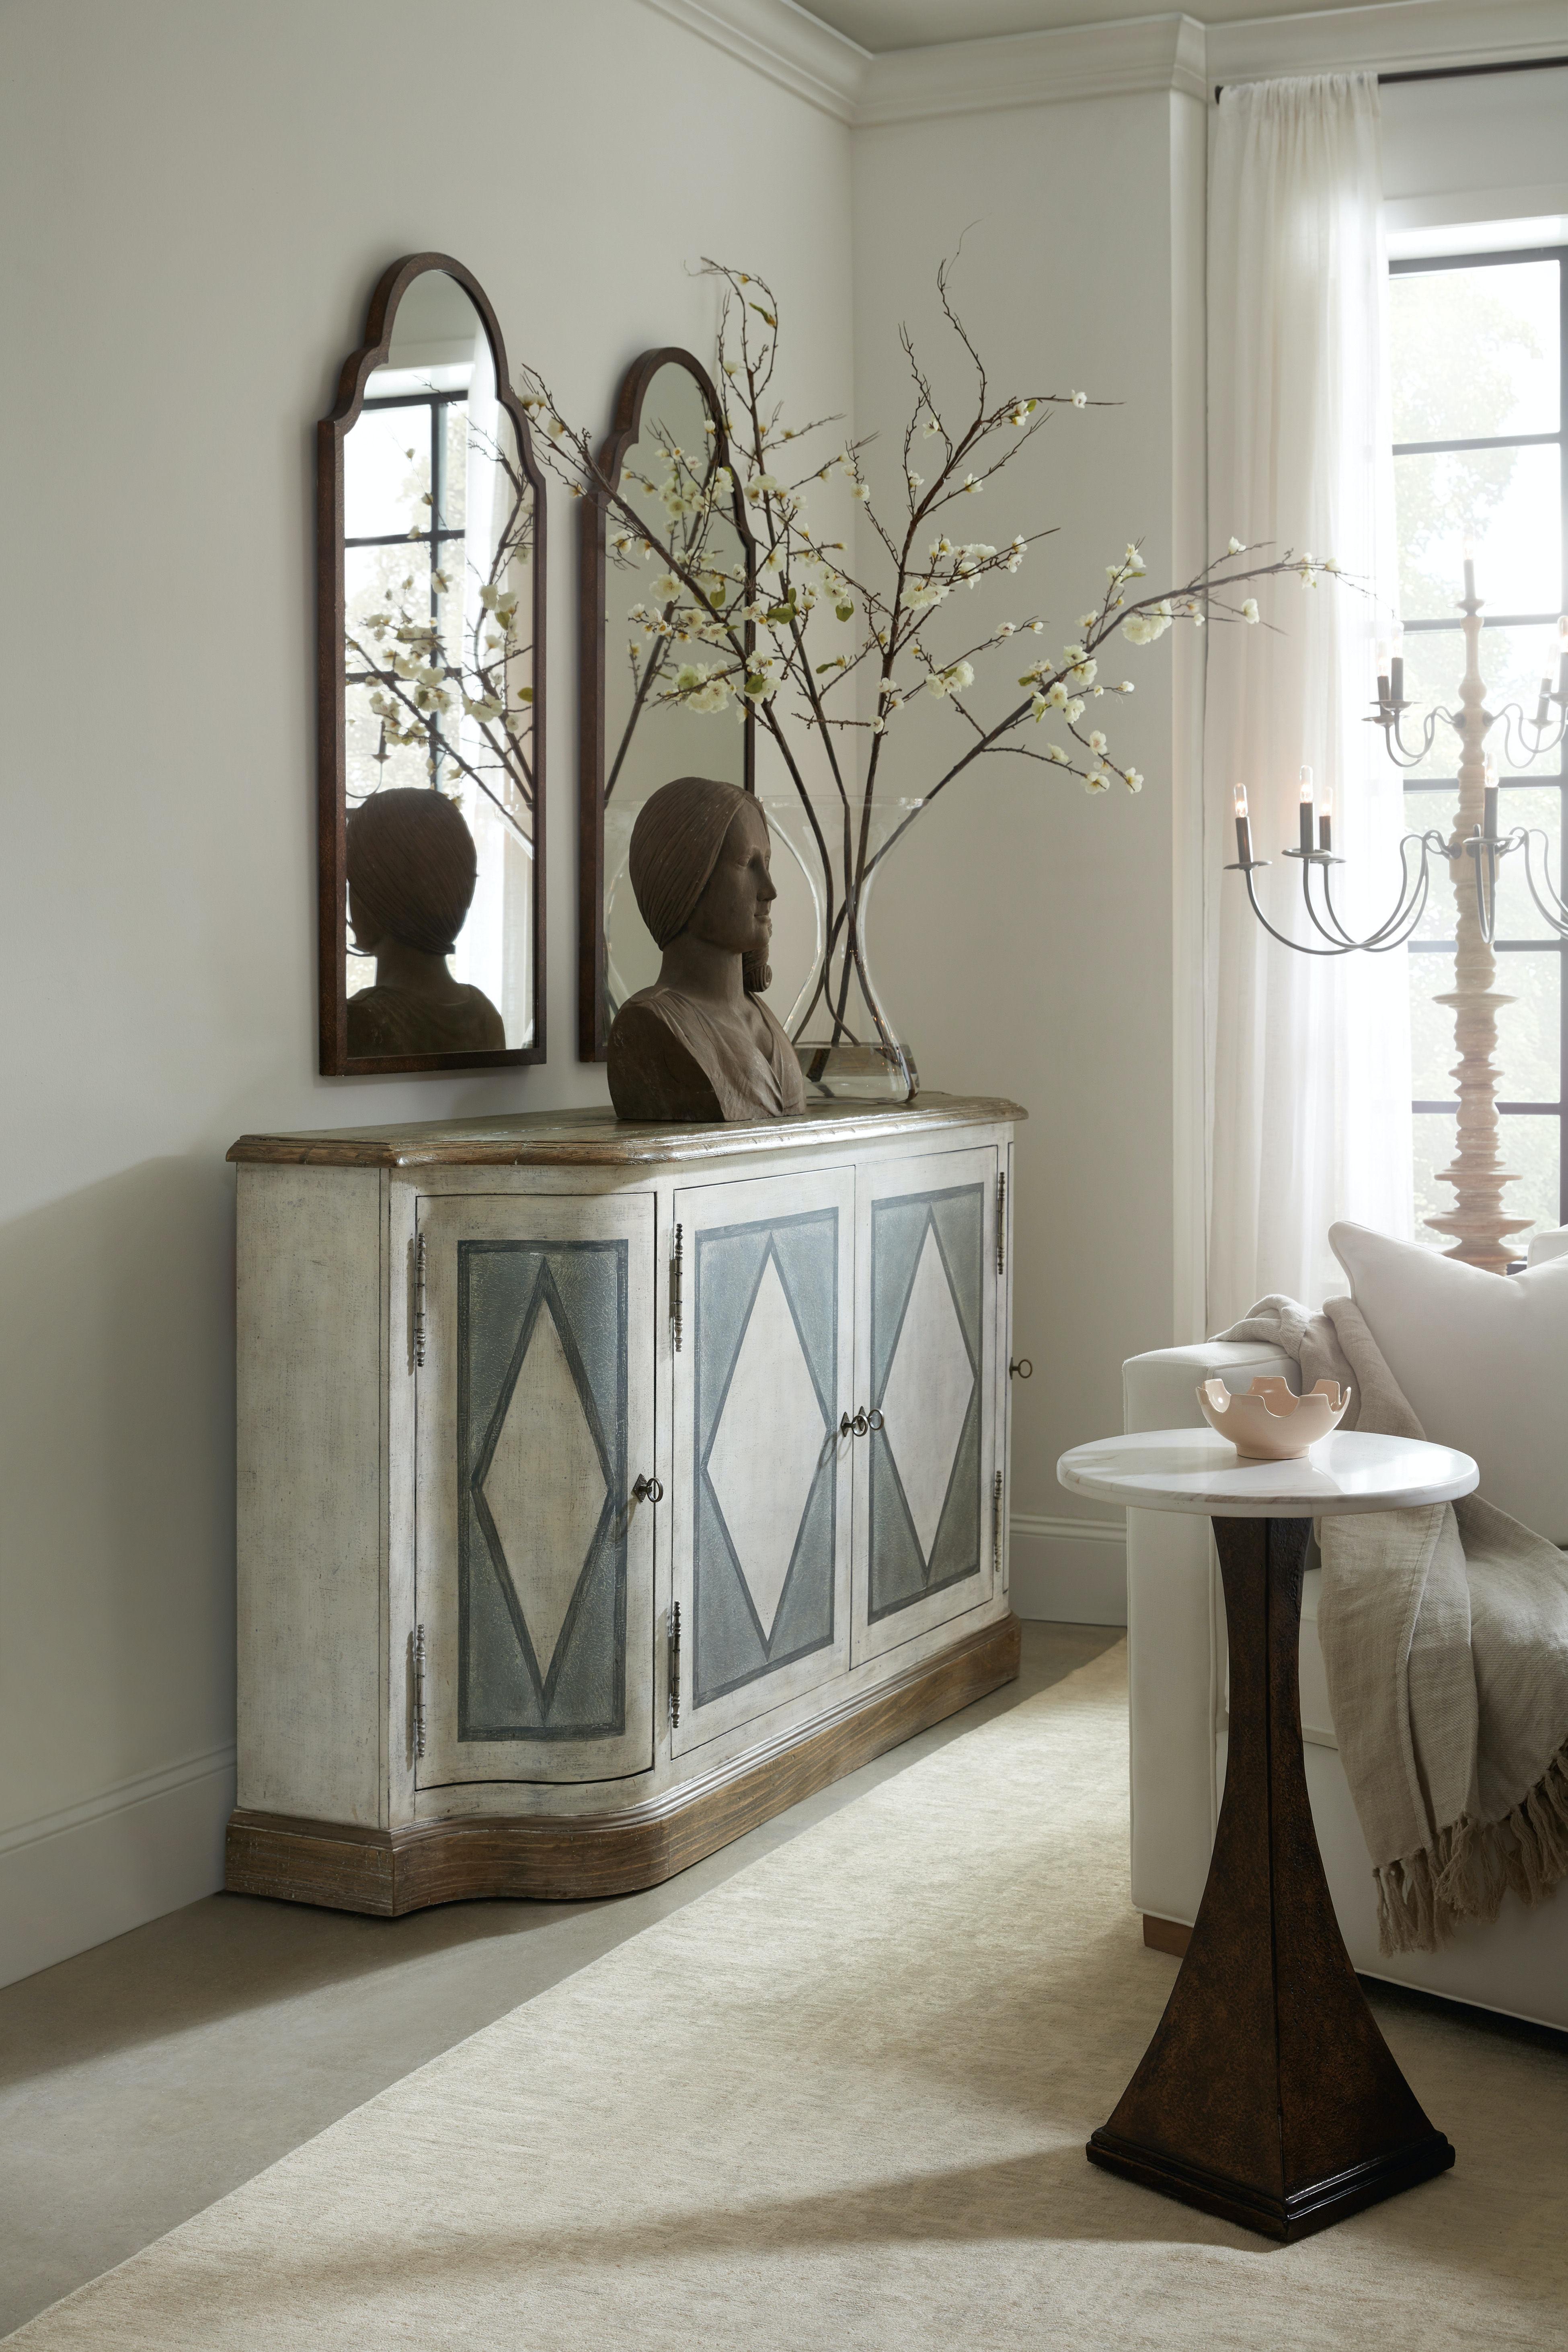 Merveilleux Hooker Furniture Boheme Saint Germain Server 5750 75900 MULTI